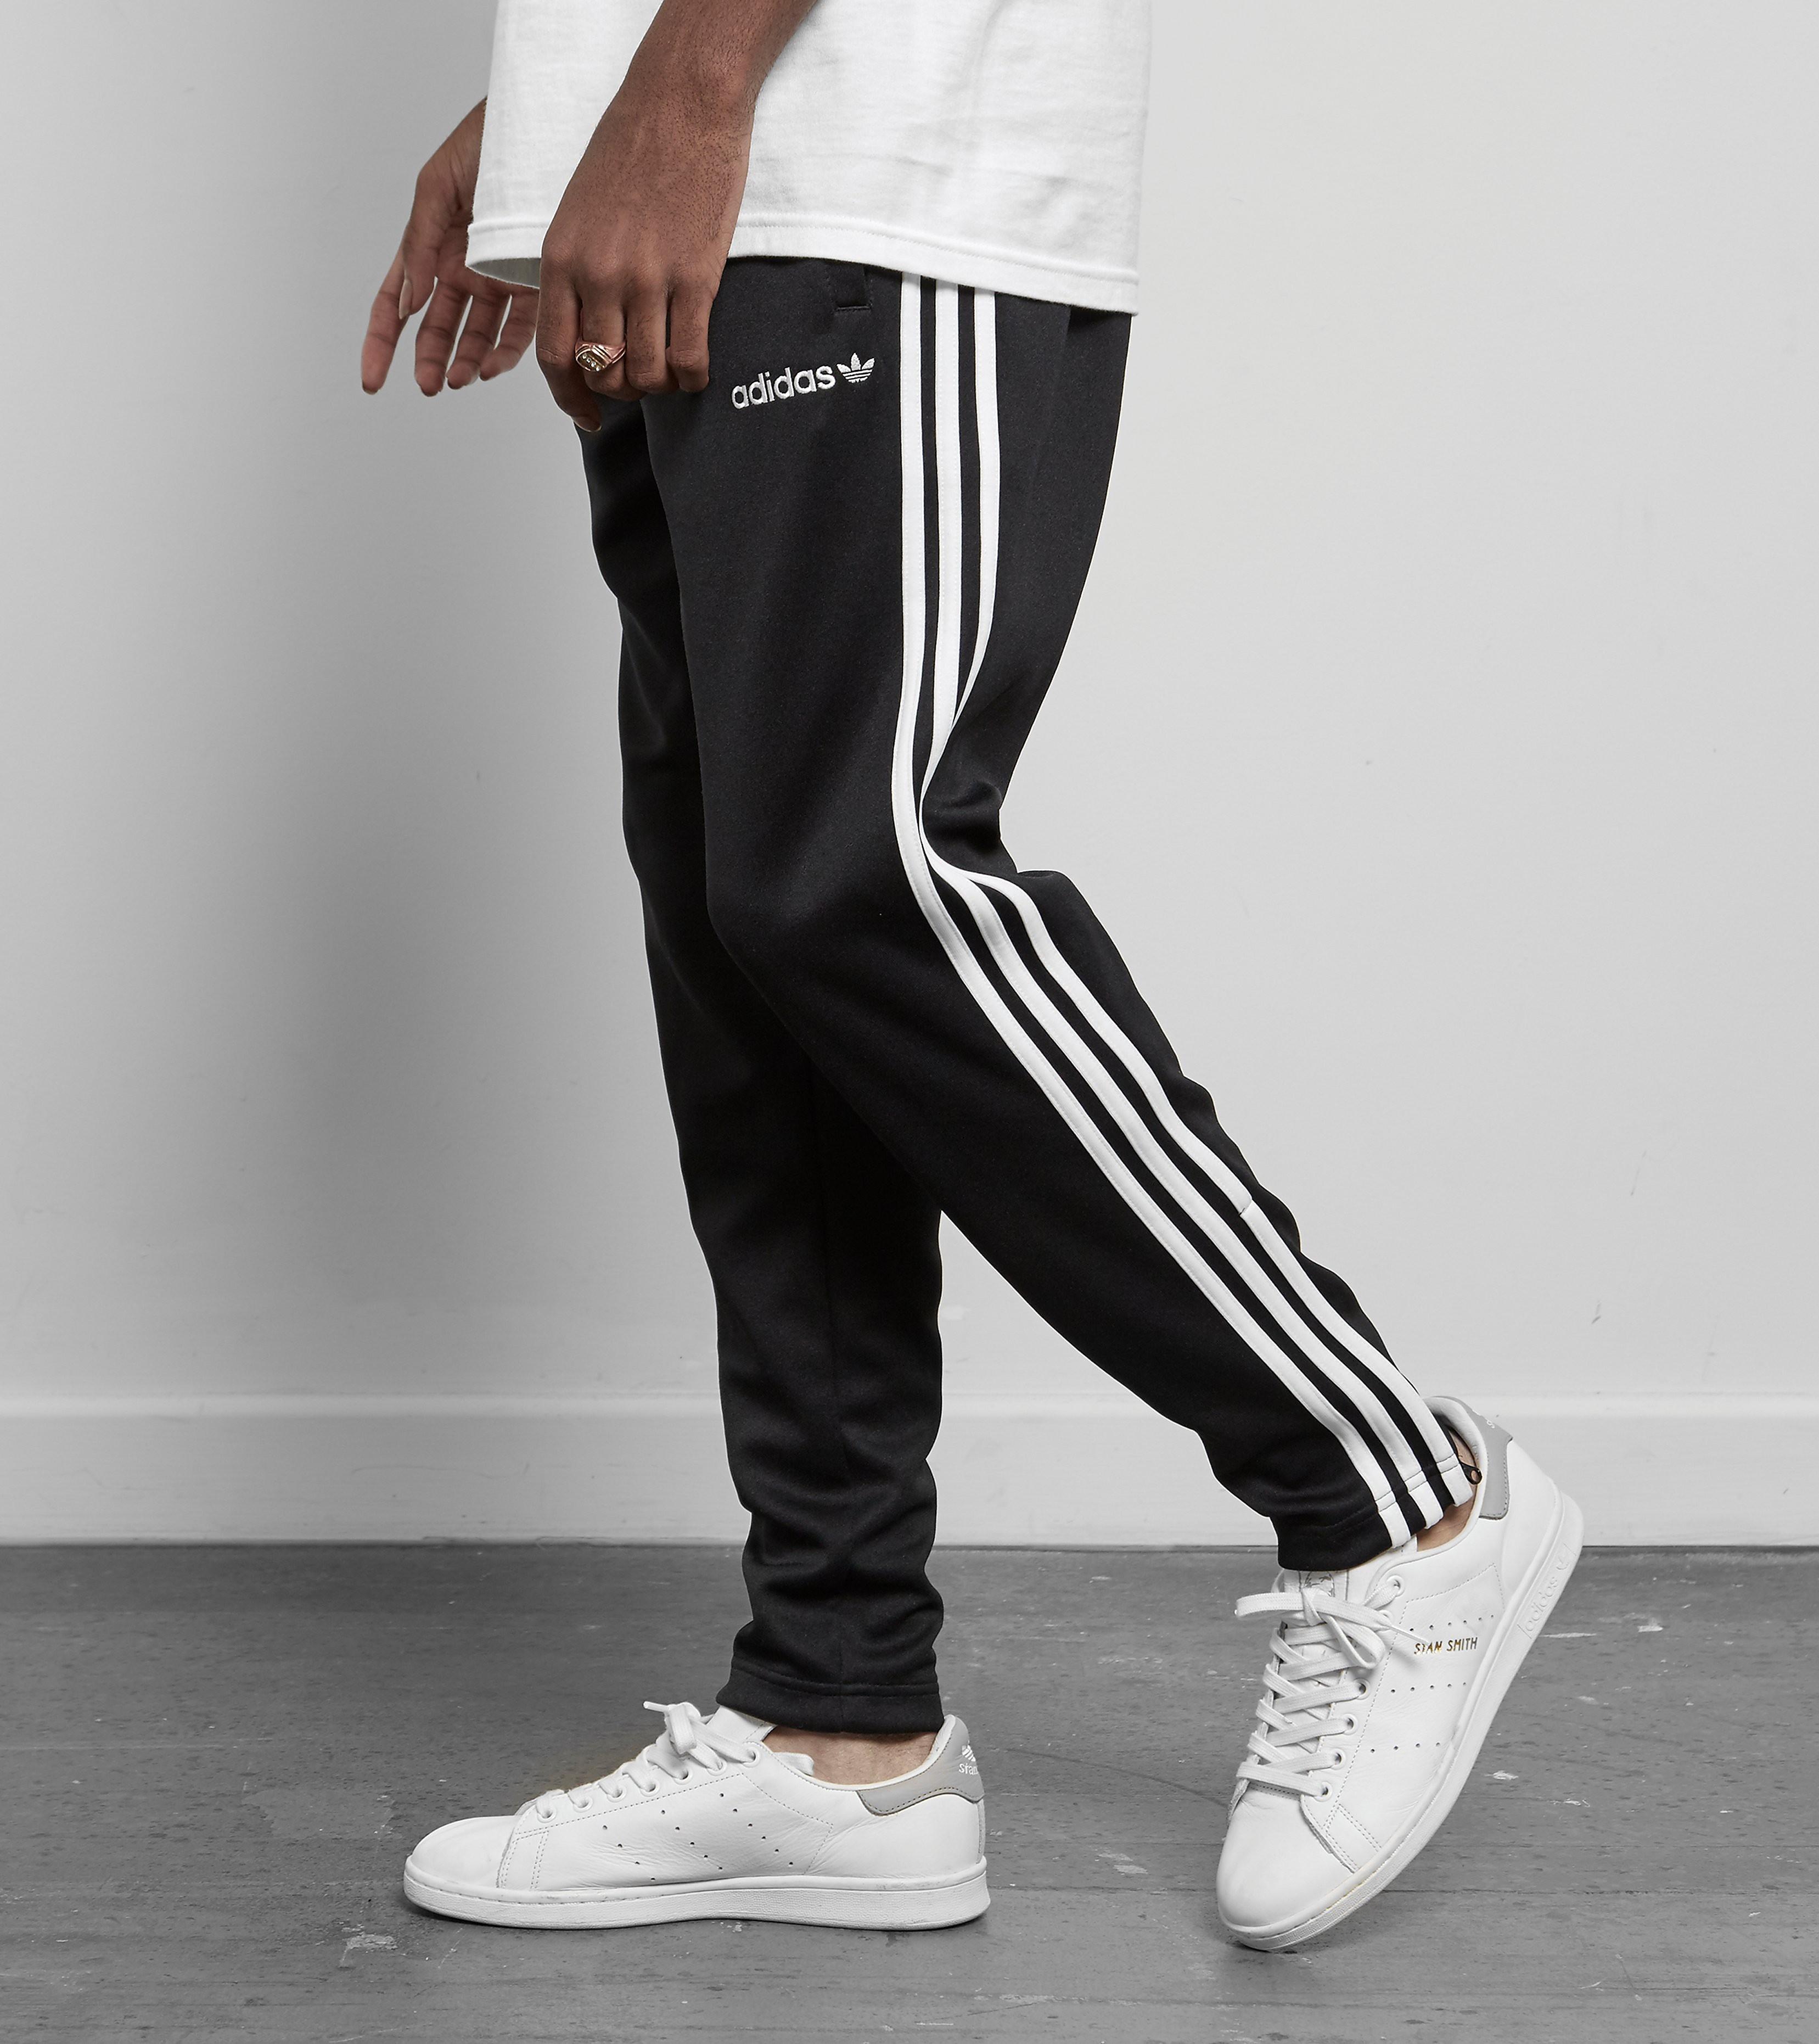 adidas Originals Superstar Taper Track Pant - size? Exclusive